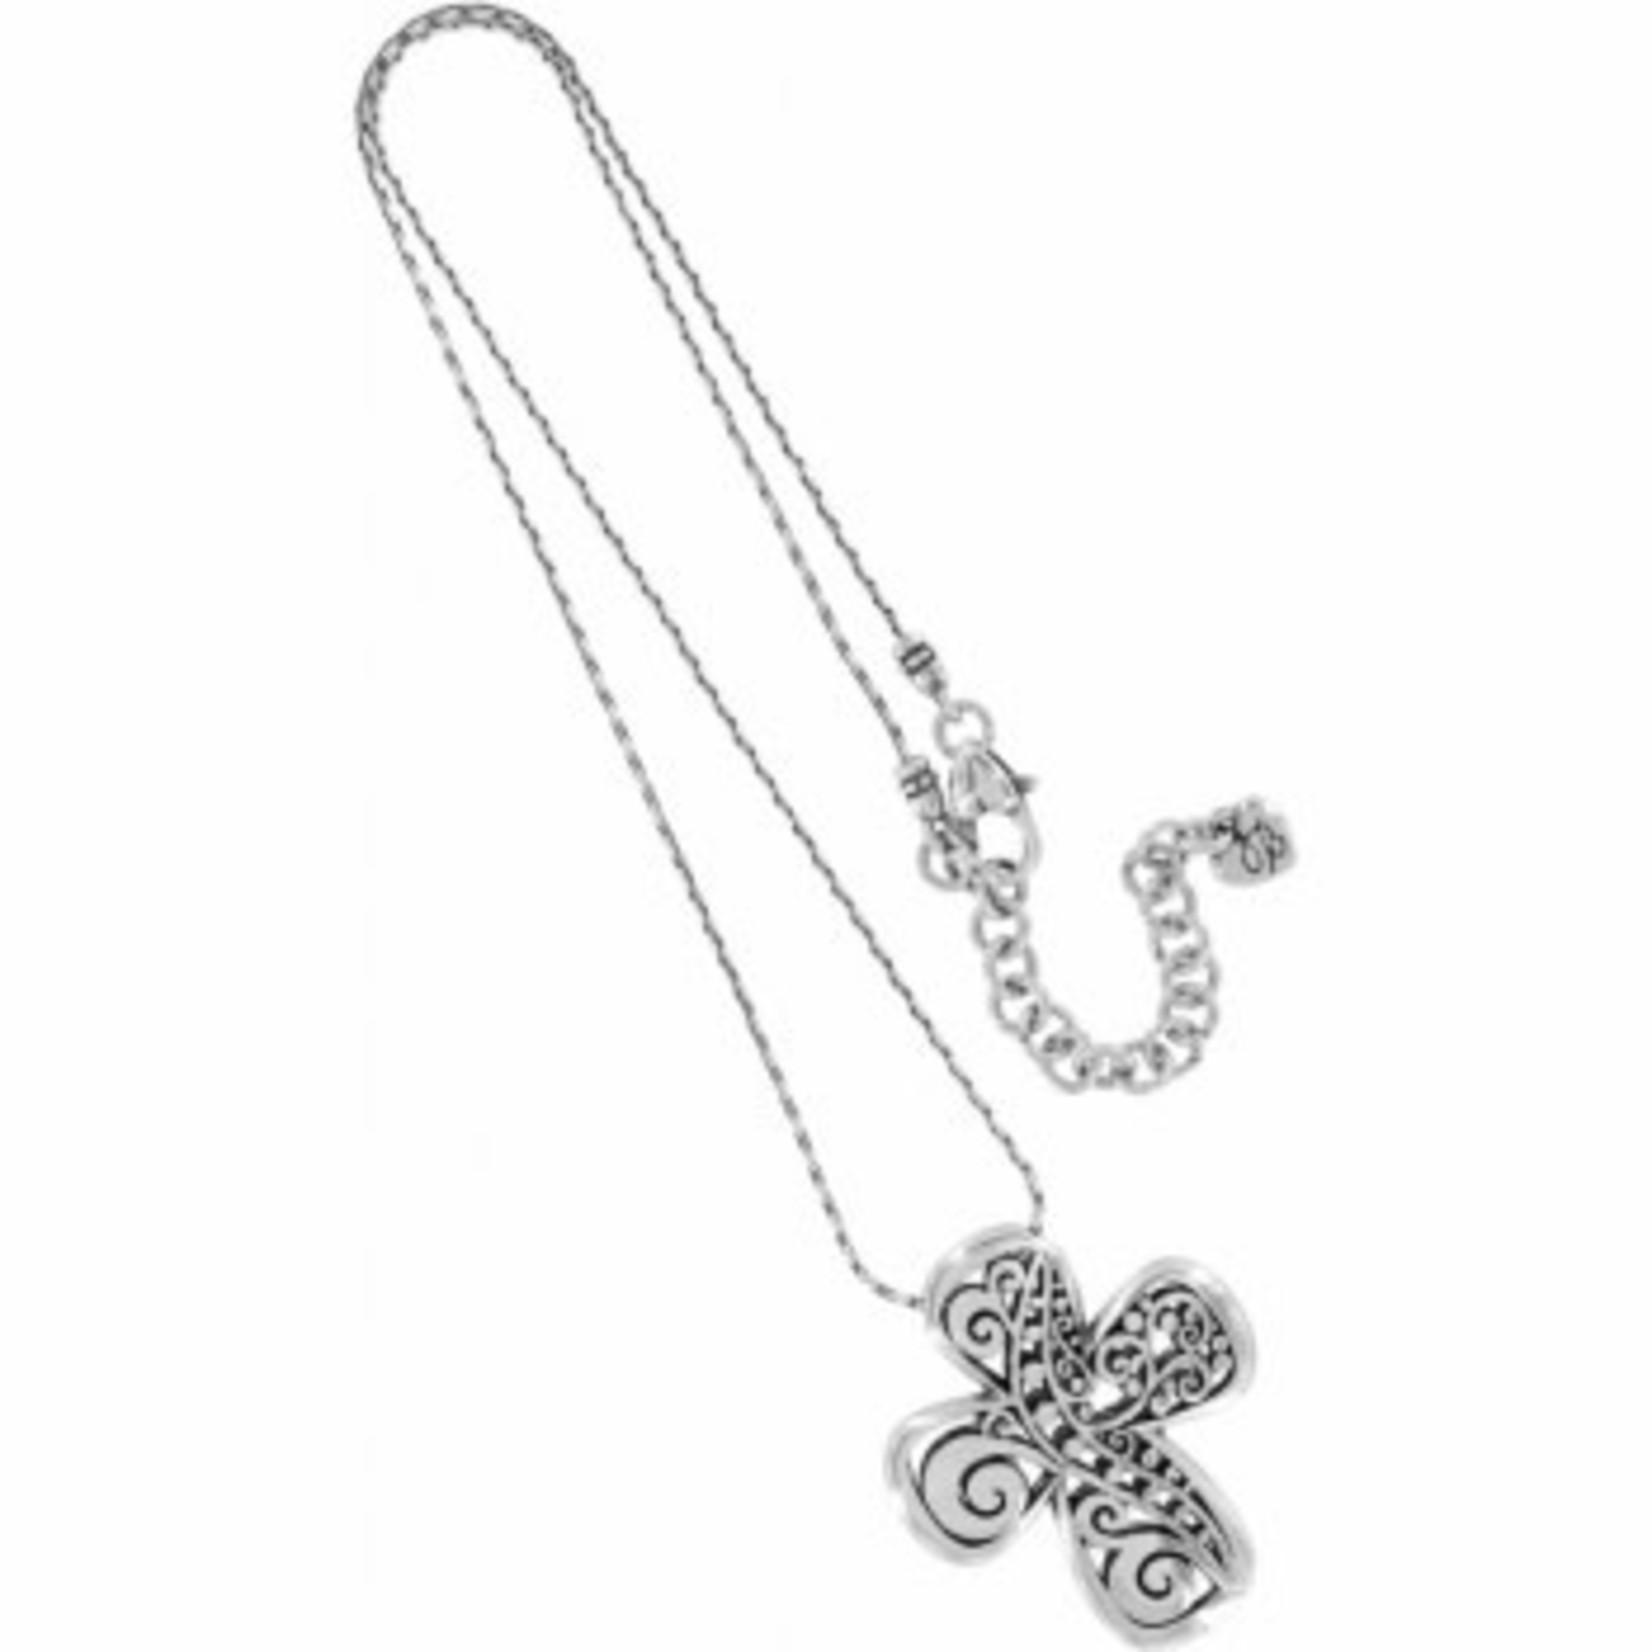 Brighton Love Affair Reversible Cross Necklace silver